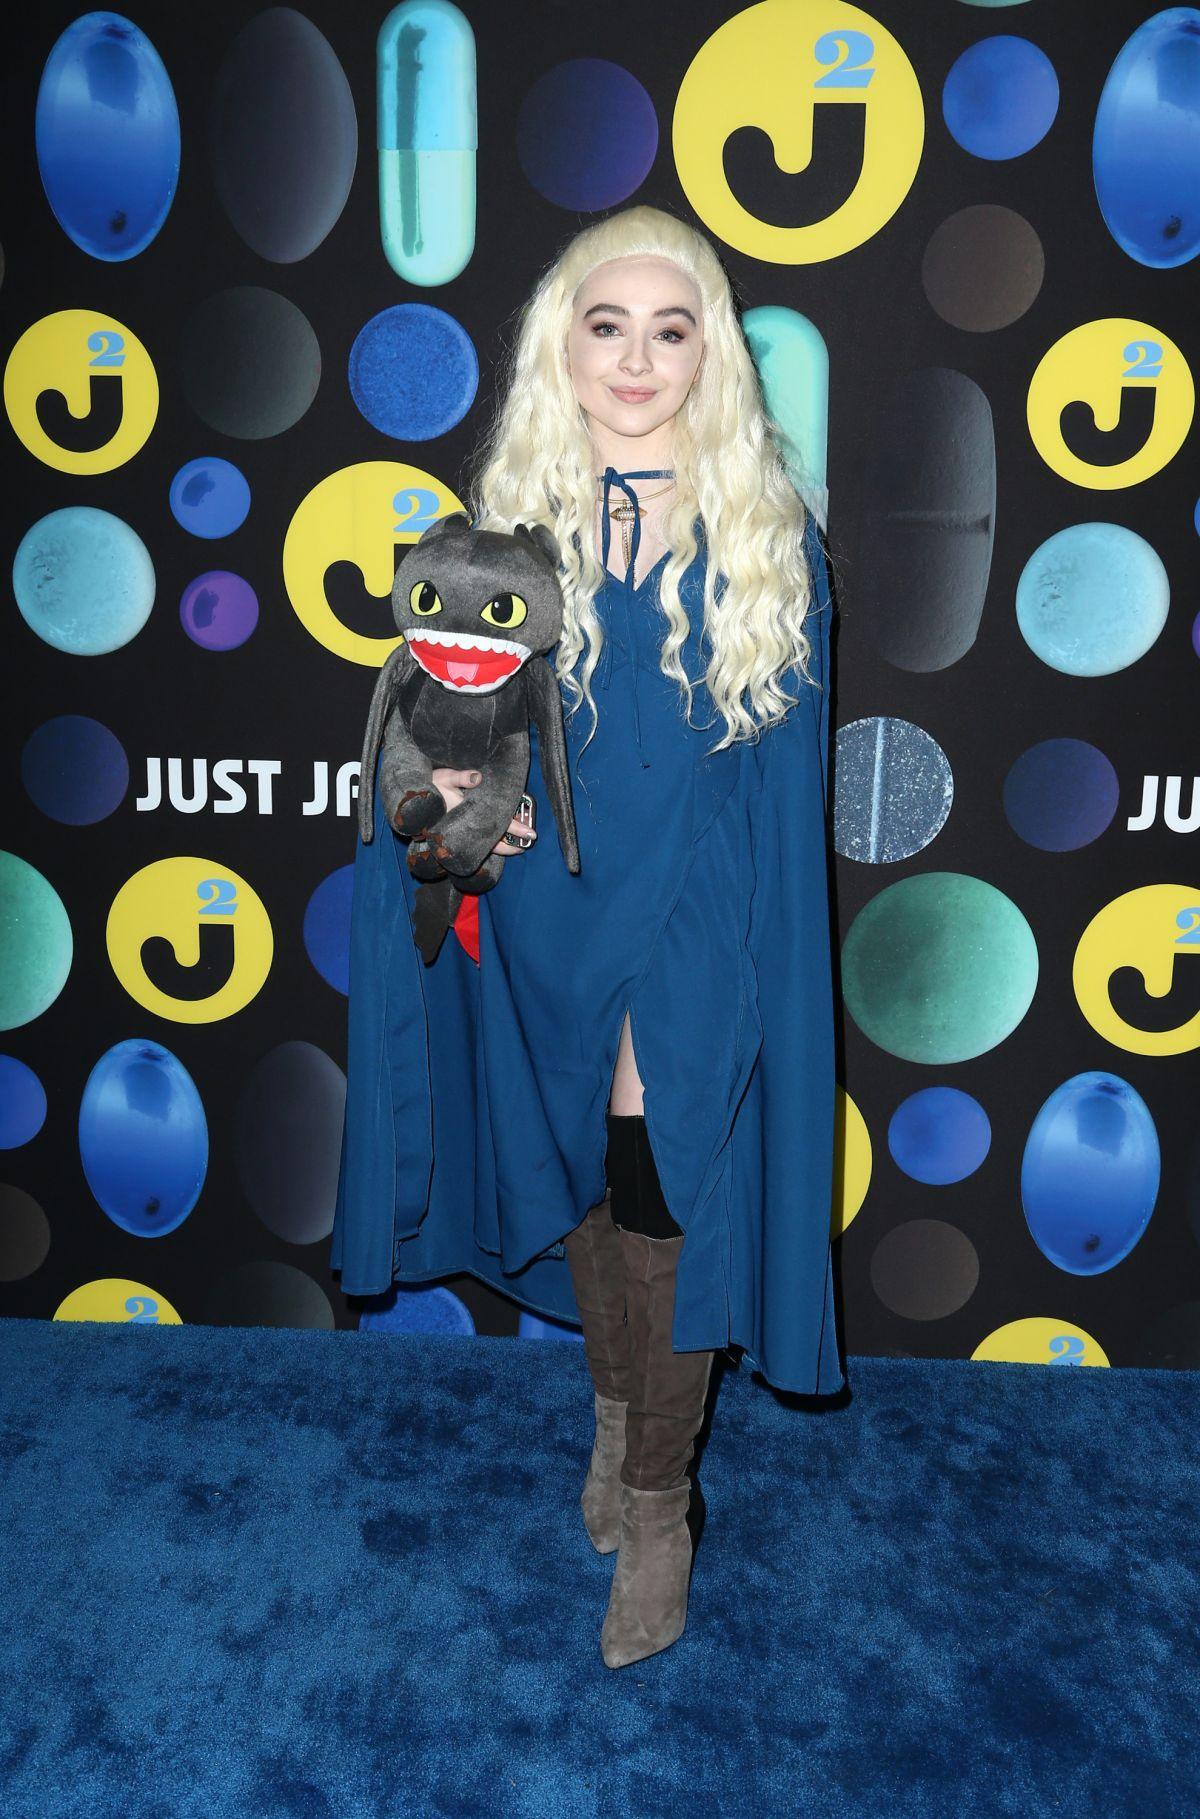 SABRINA CARPENTER at Just Jared Halloween Party in Hollywood 10/31/2015